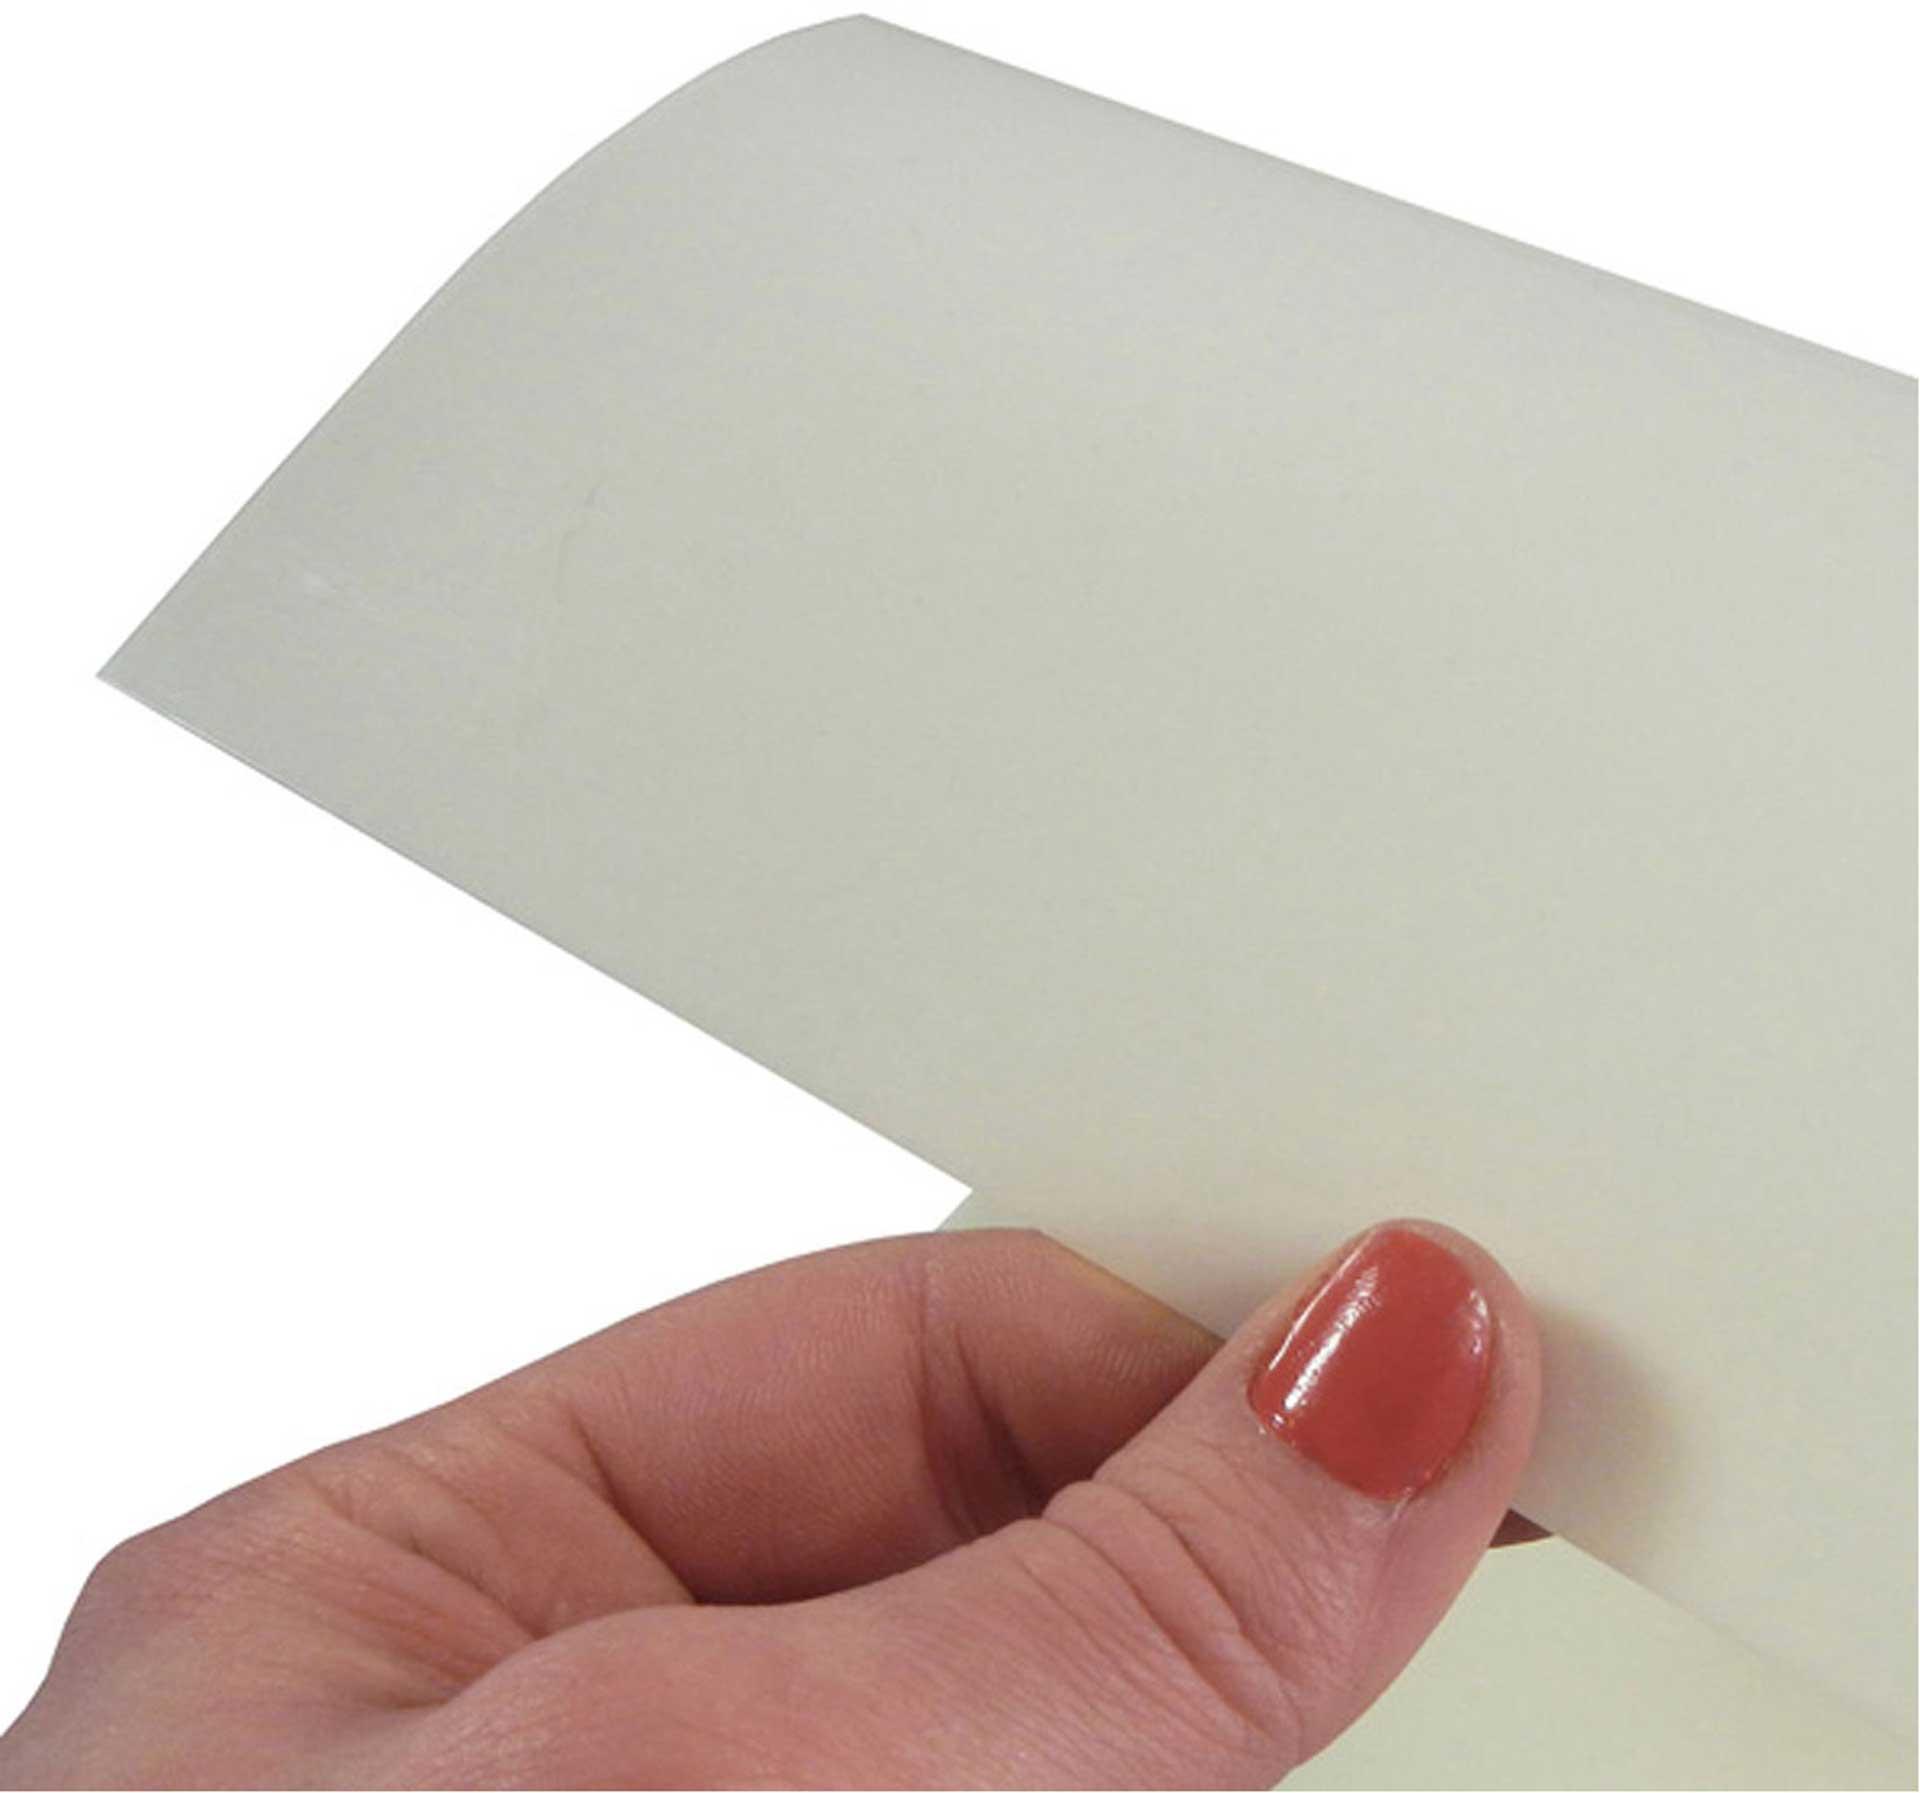 R&G PET-Folie Mylar® A 350 (50 cm) Rolle/ 2 m